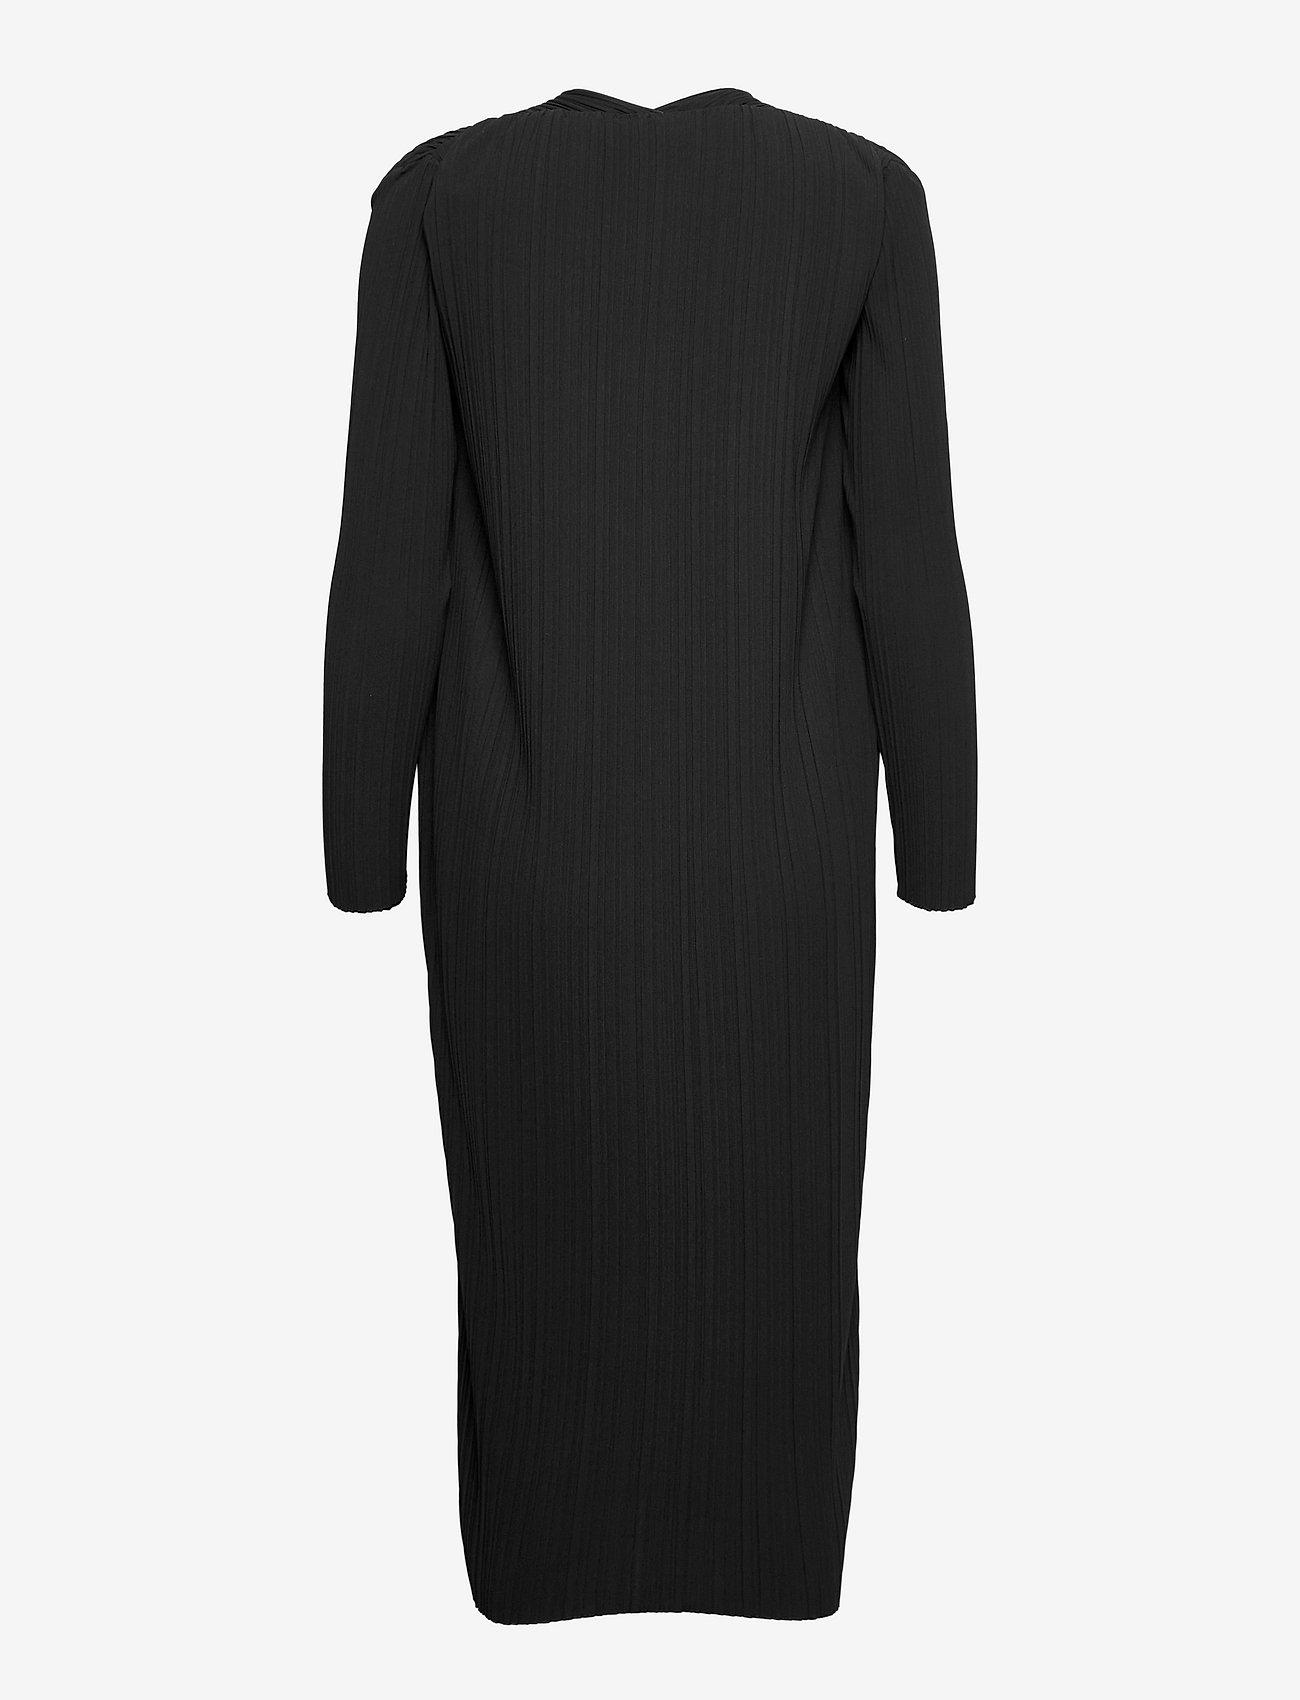 Max Mara Leisure - TUBO - midi dresses - black - 1